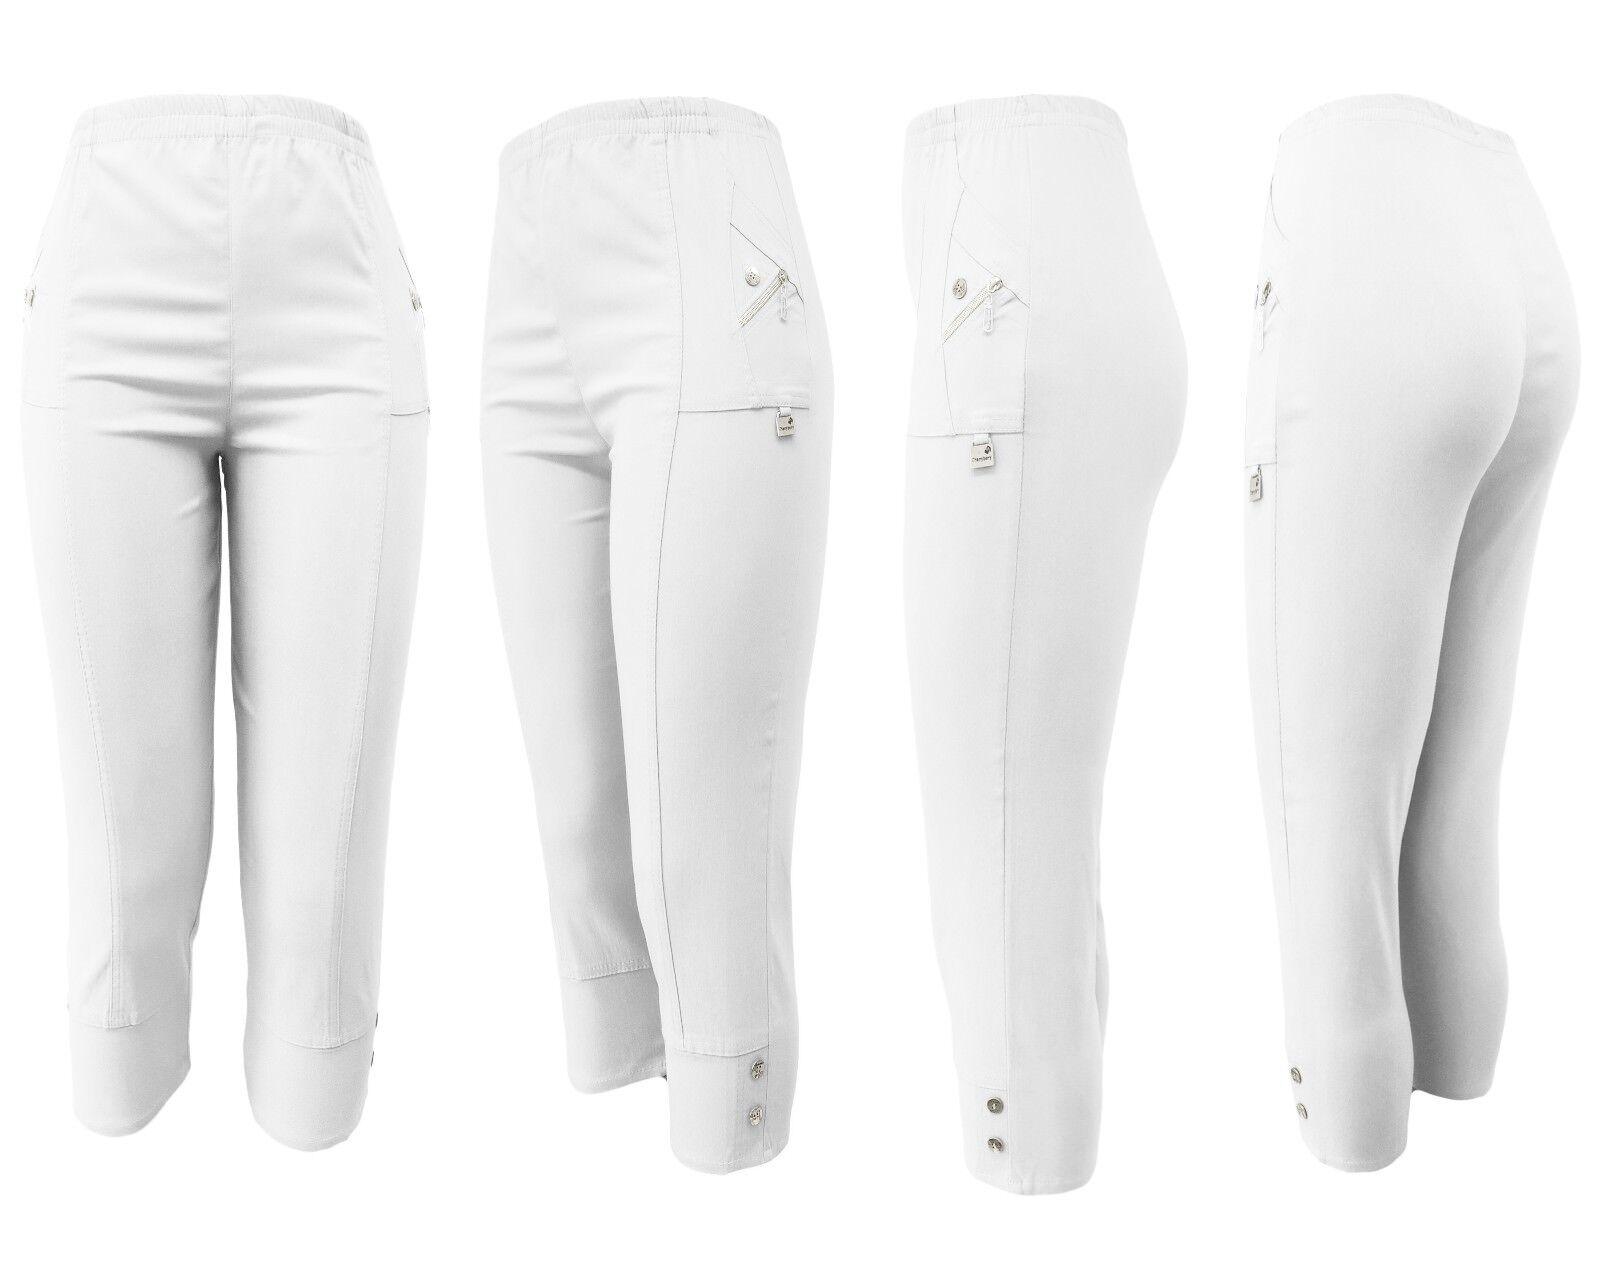 Kurze Hosen Damen - 7/8 Stoffhose mit Gummizug leichte Capri Stoffhose Gr. 38-54